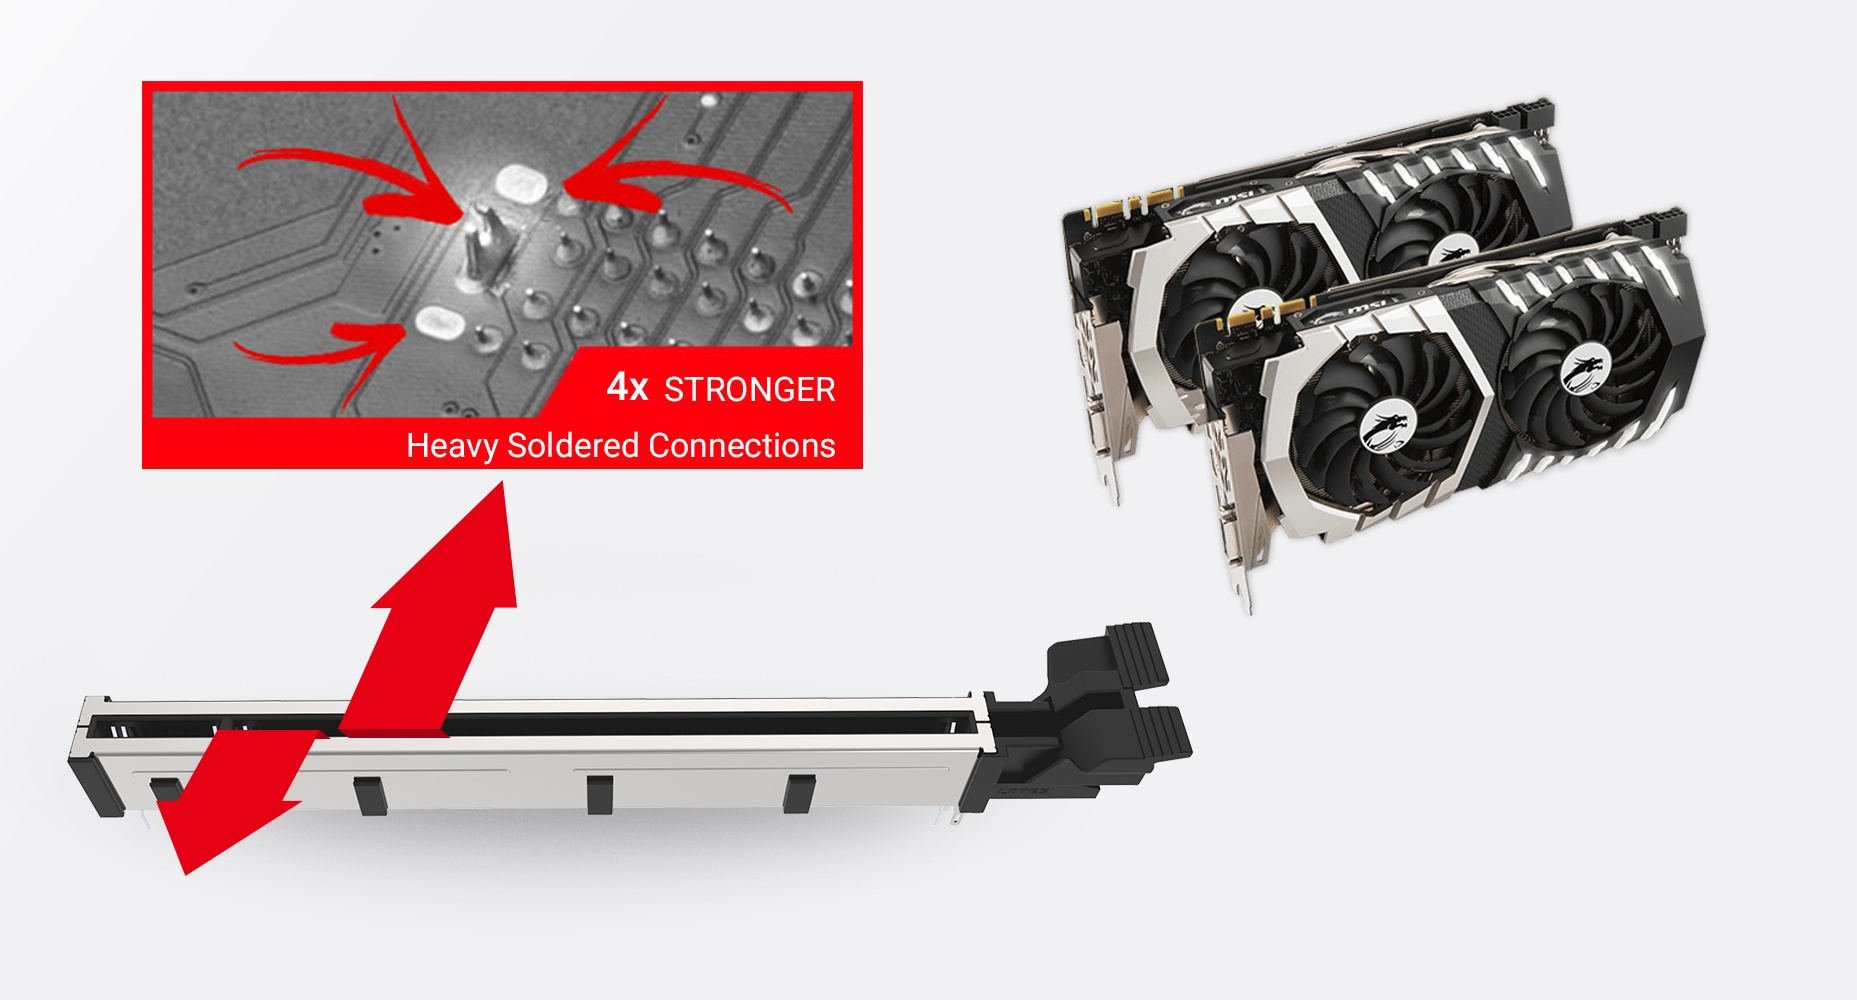 MSI B450 TOMAHAWK MAX II MULTIPLE GPU SUPPORTS AND STEEL ARMOR